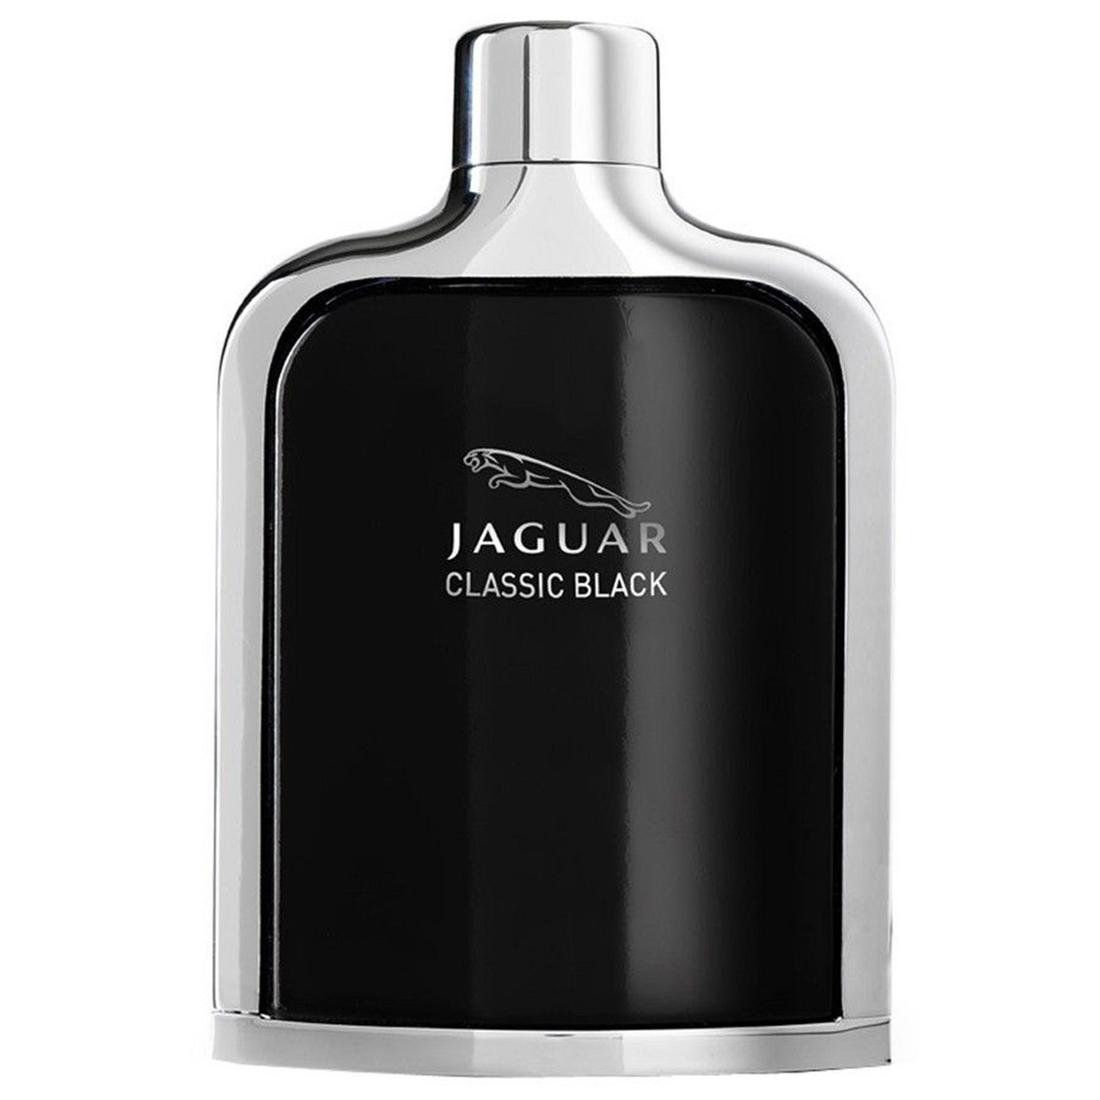 Jaguar Classic Black - (TESTER) toaletní voda Objem: 100 ml